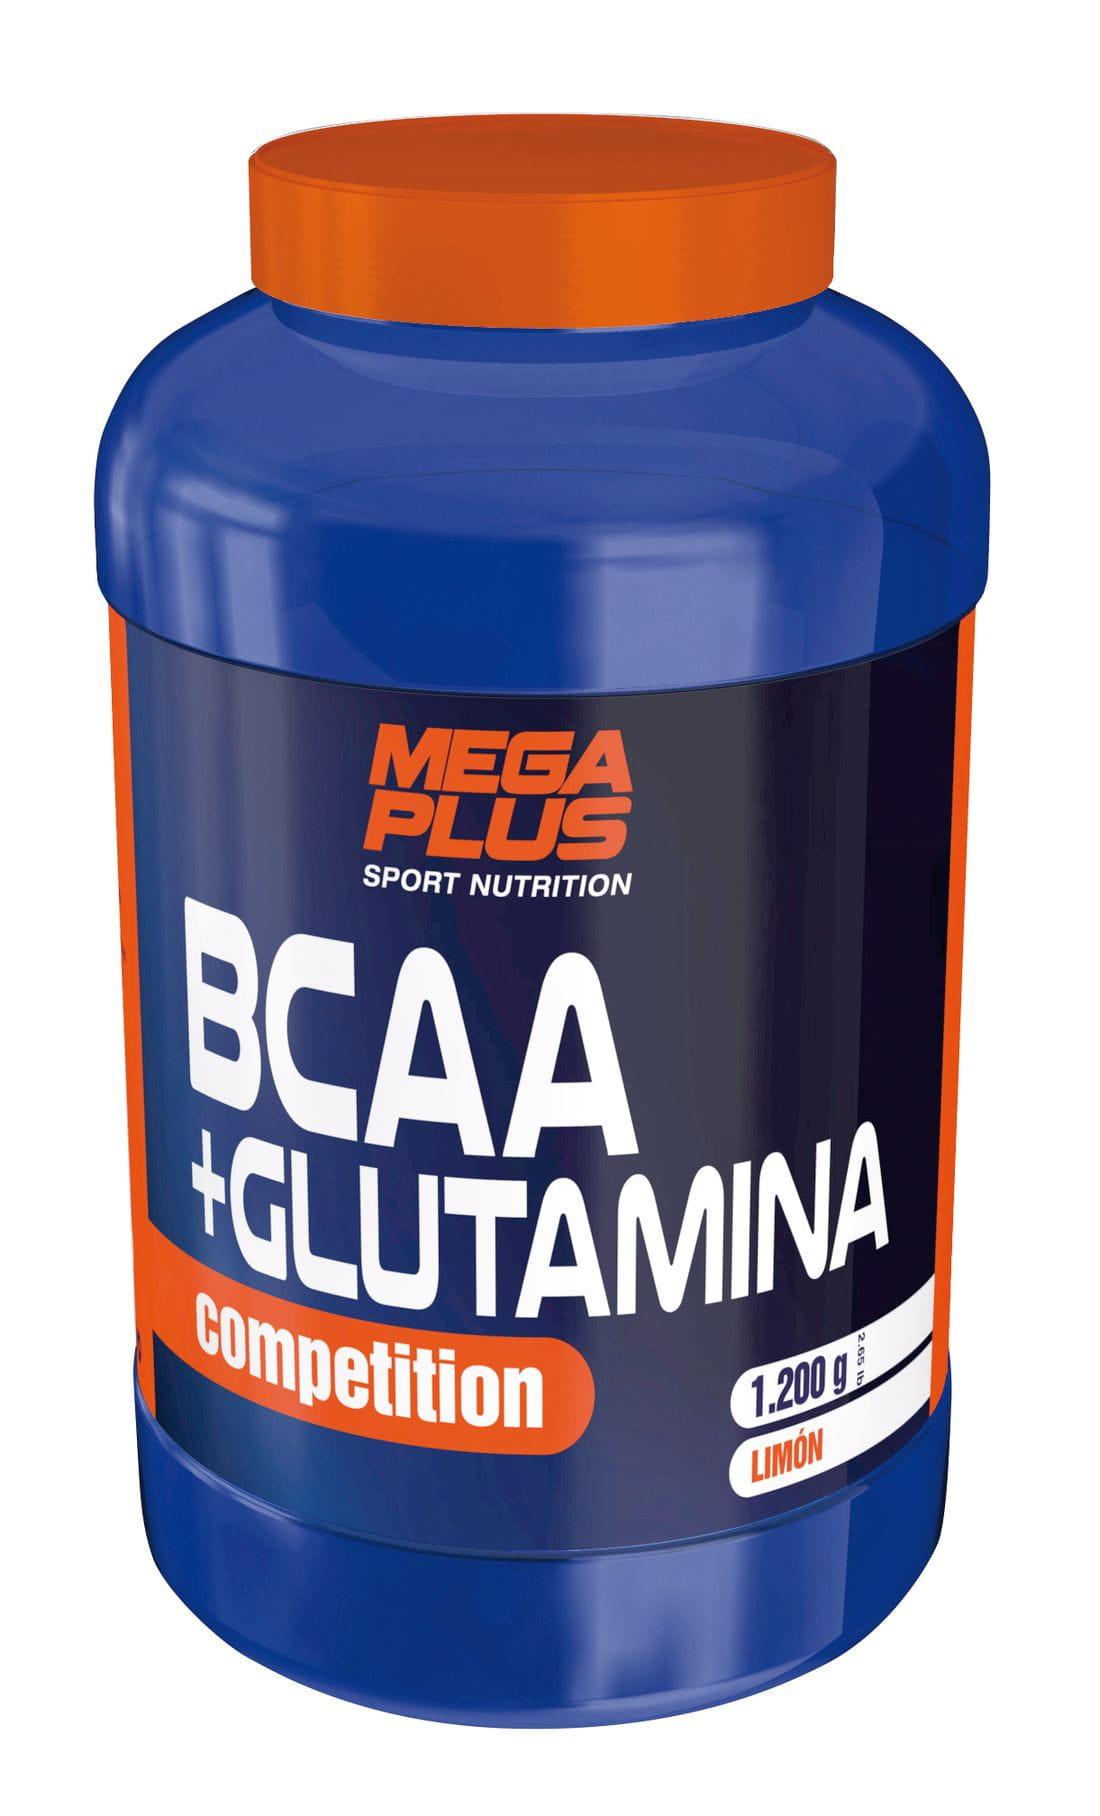 MEGA PLUS BCAA+GLUTAMINA